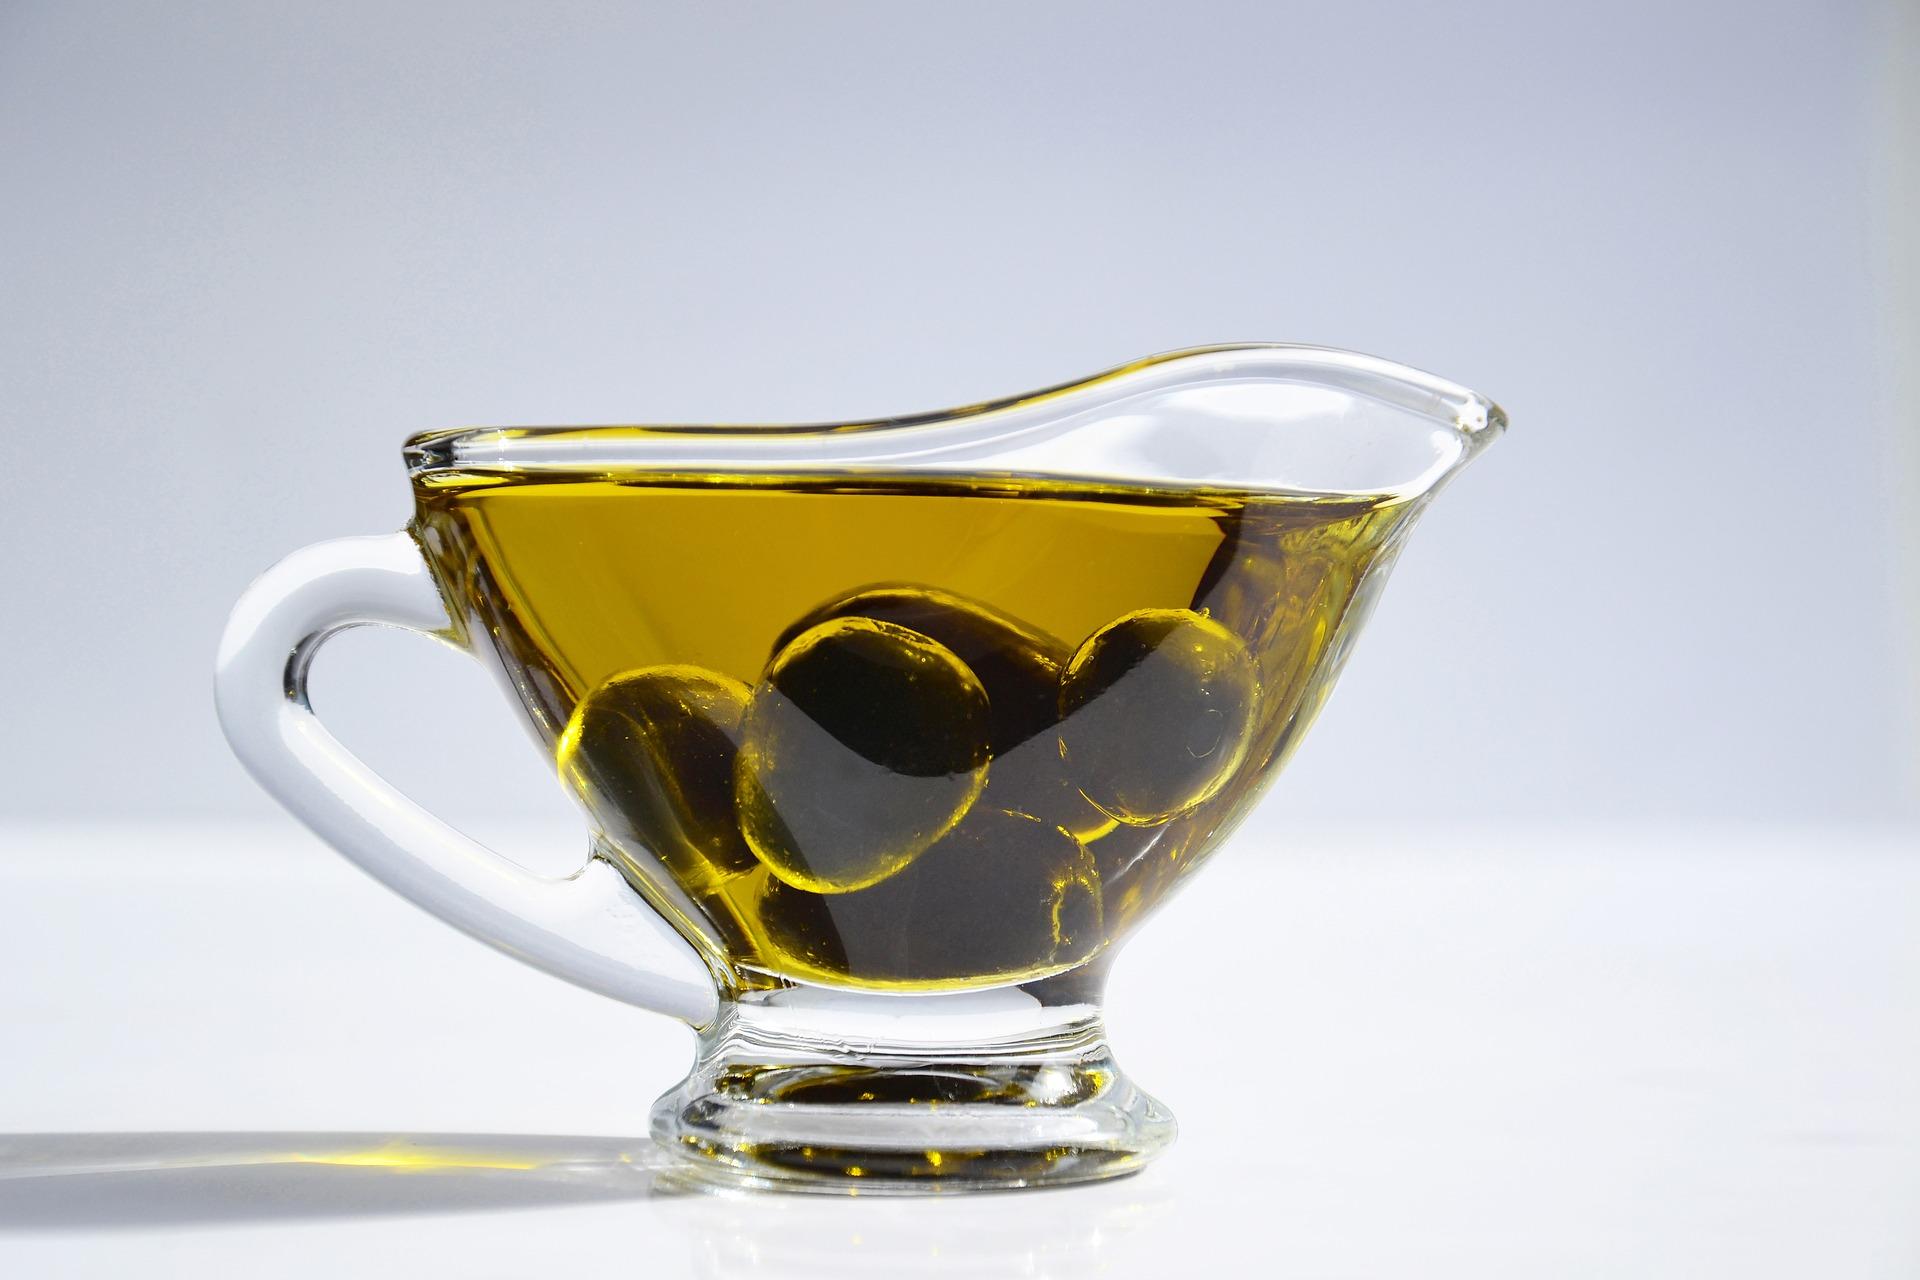 Ini 9 Cara Menggunakan Olive Oil Untuk Wajah Dan Rambut Yang Wajib Kamu Coba Blog Sayurbox